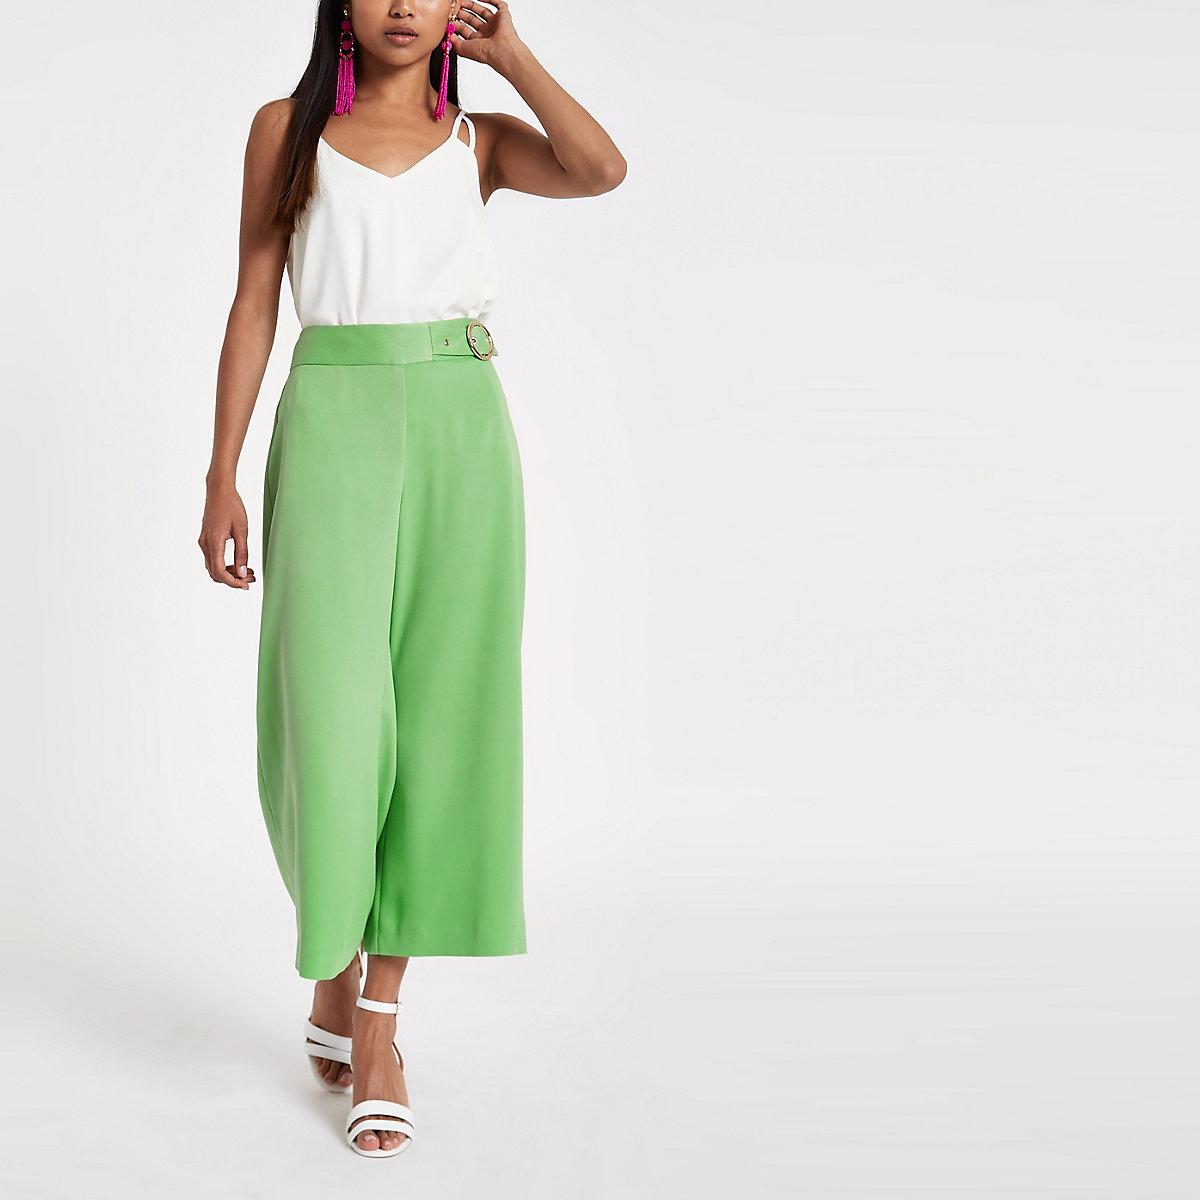 Petite green wide leg culottes